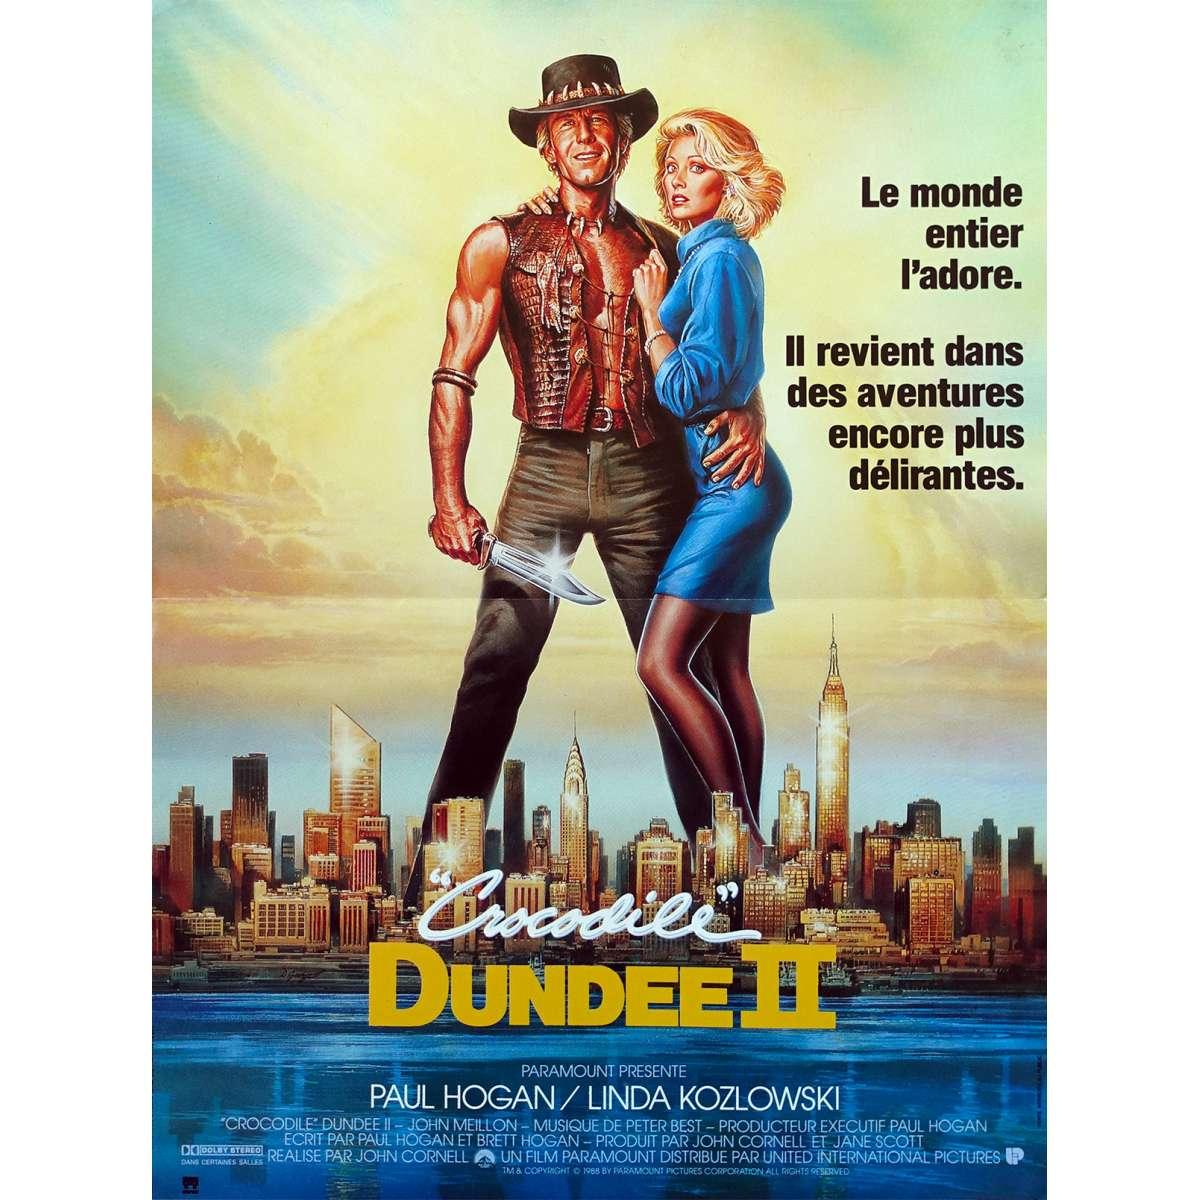 Crocodile Dundee Ii Movie Poster 15x21 In